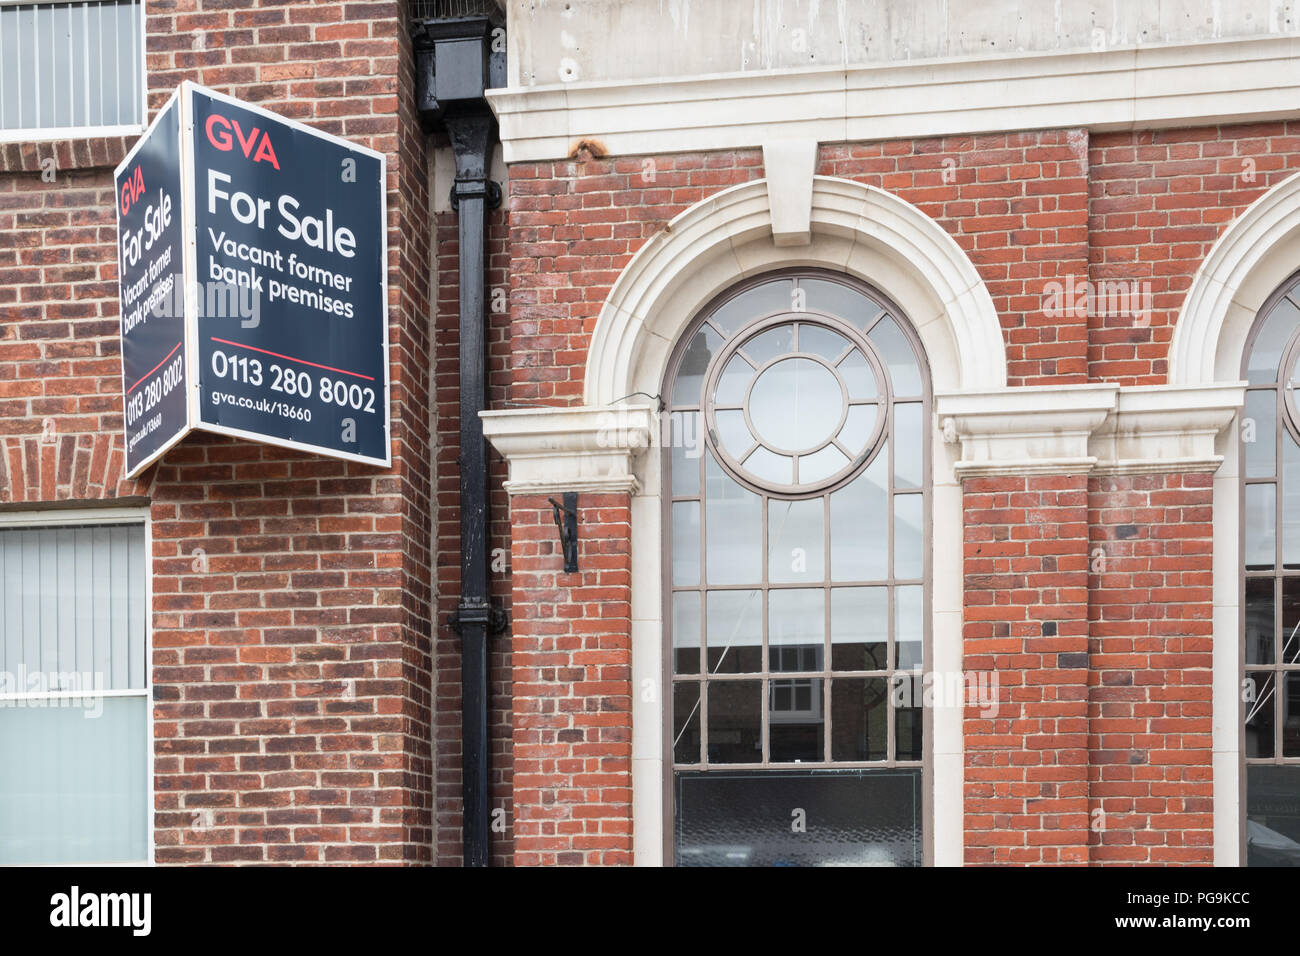 Bank premises for sale in Pocklington, East Yorkshire - Stock Image